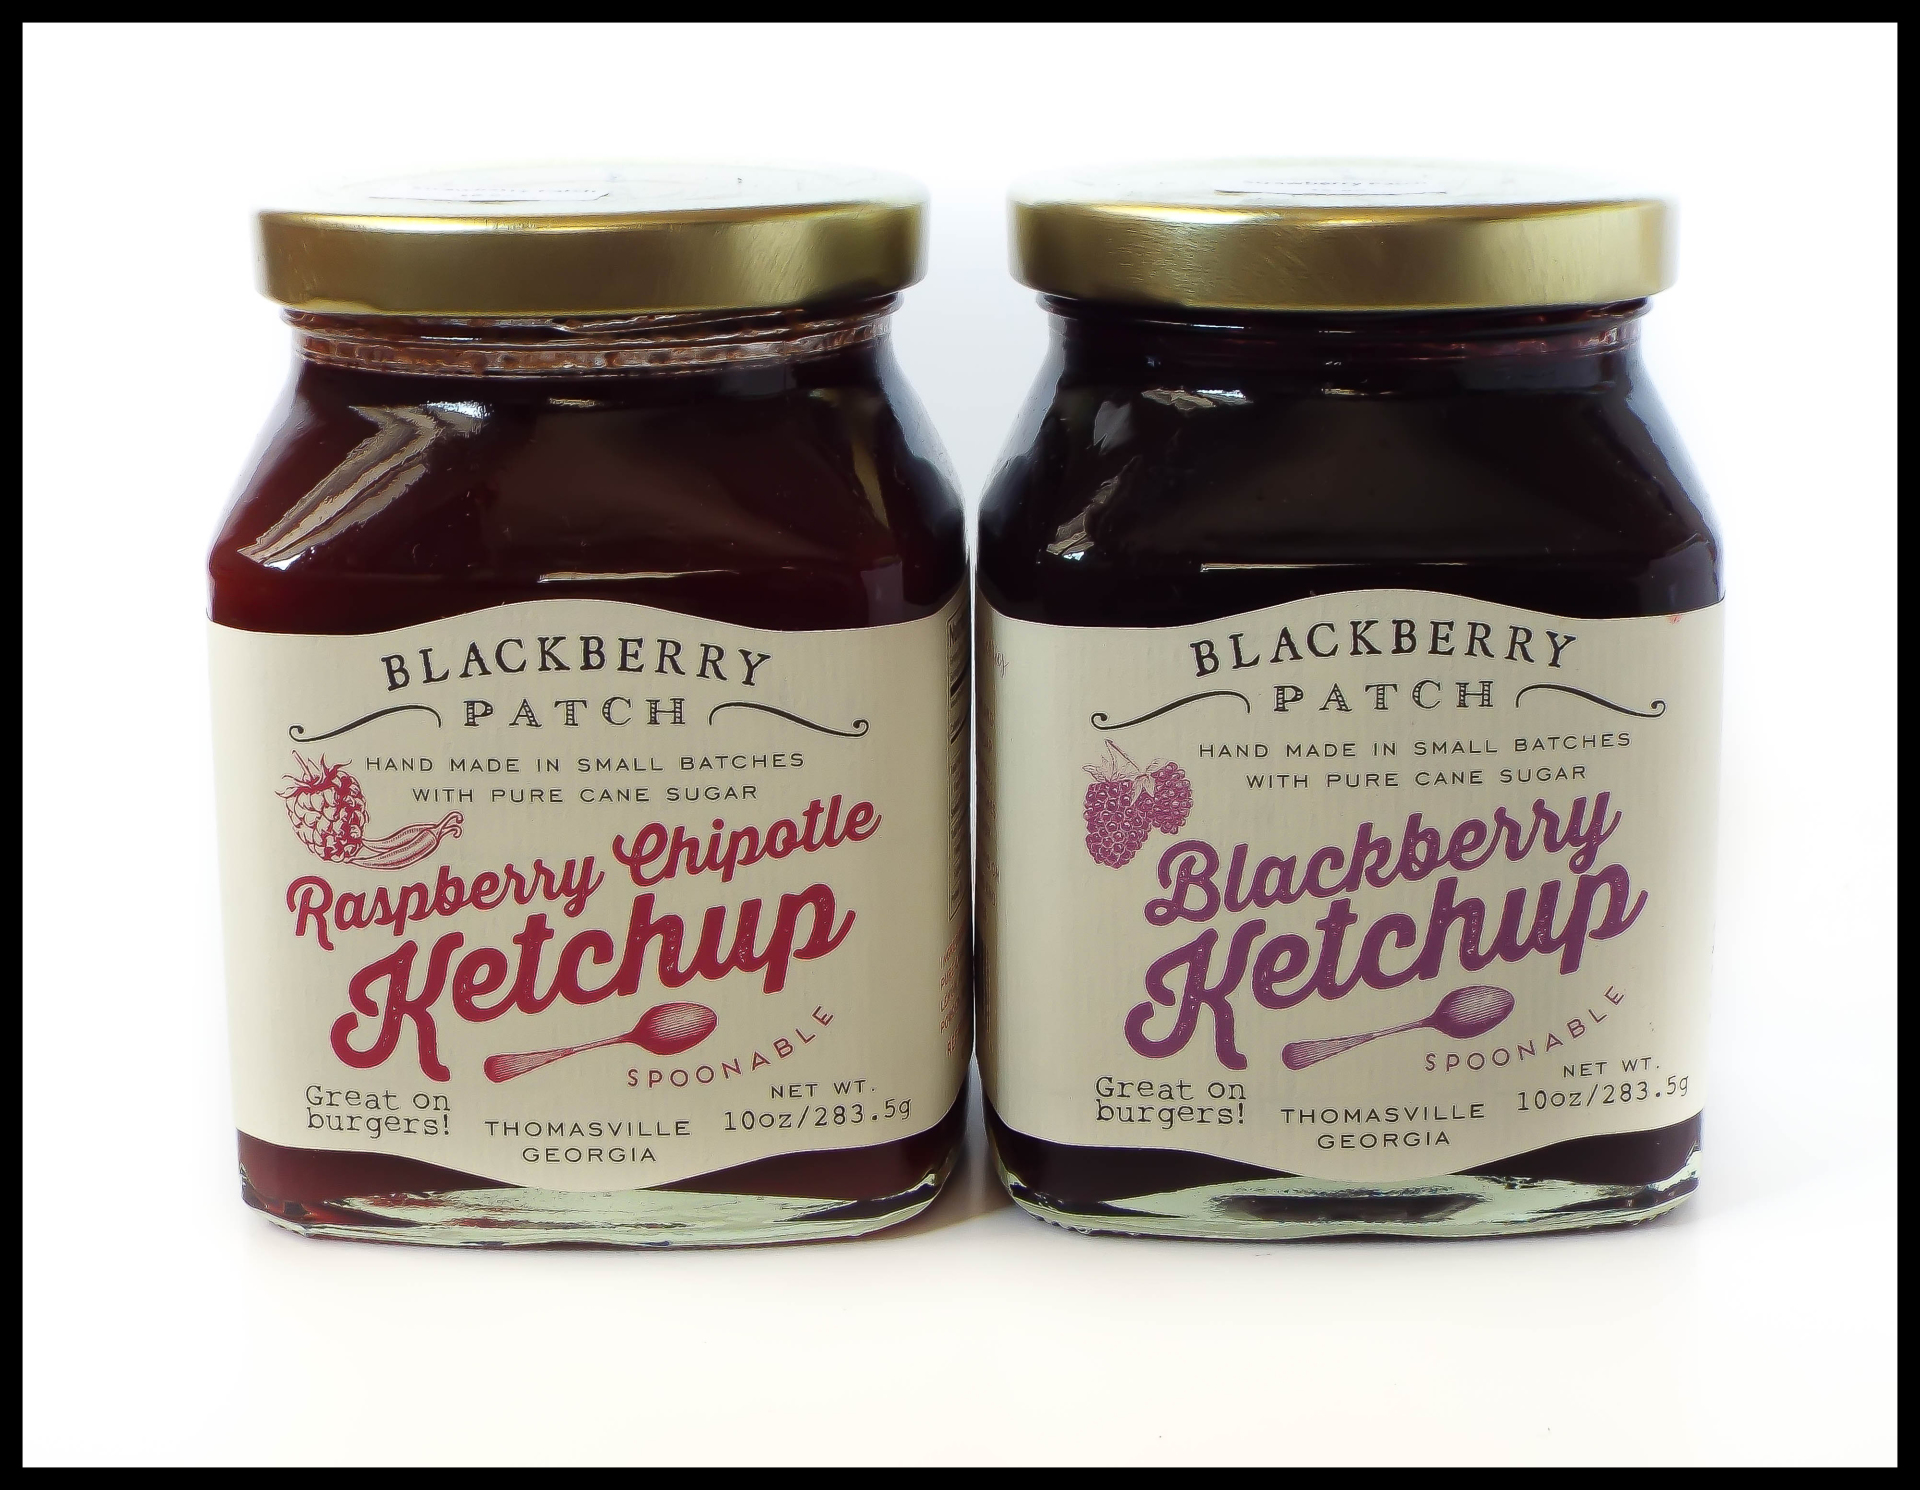 Blackberry Patch Gourmet Ketchup